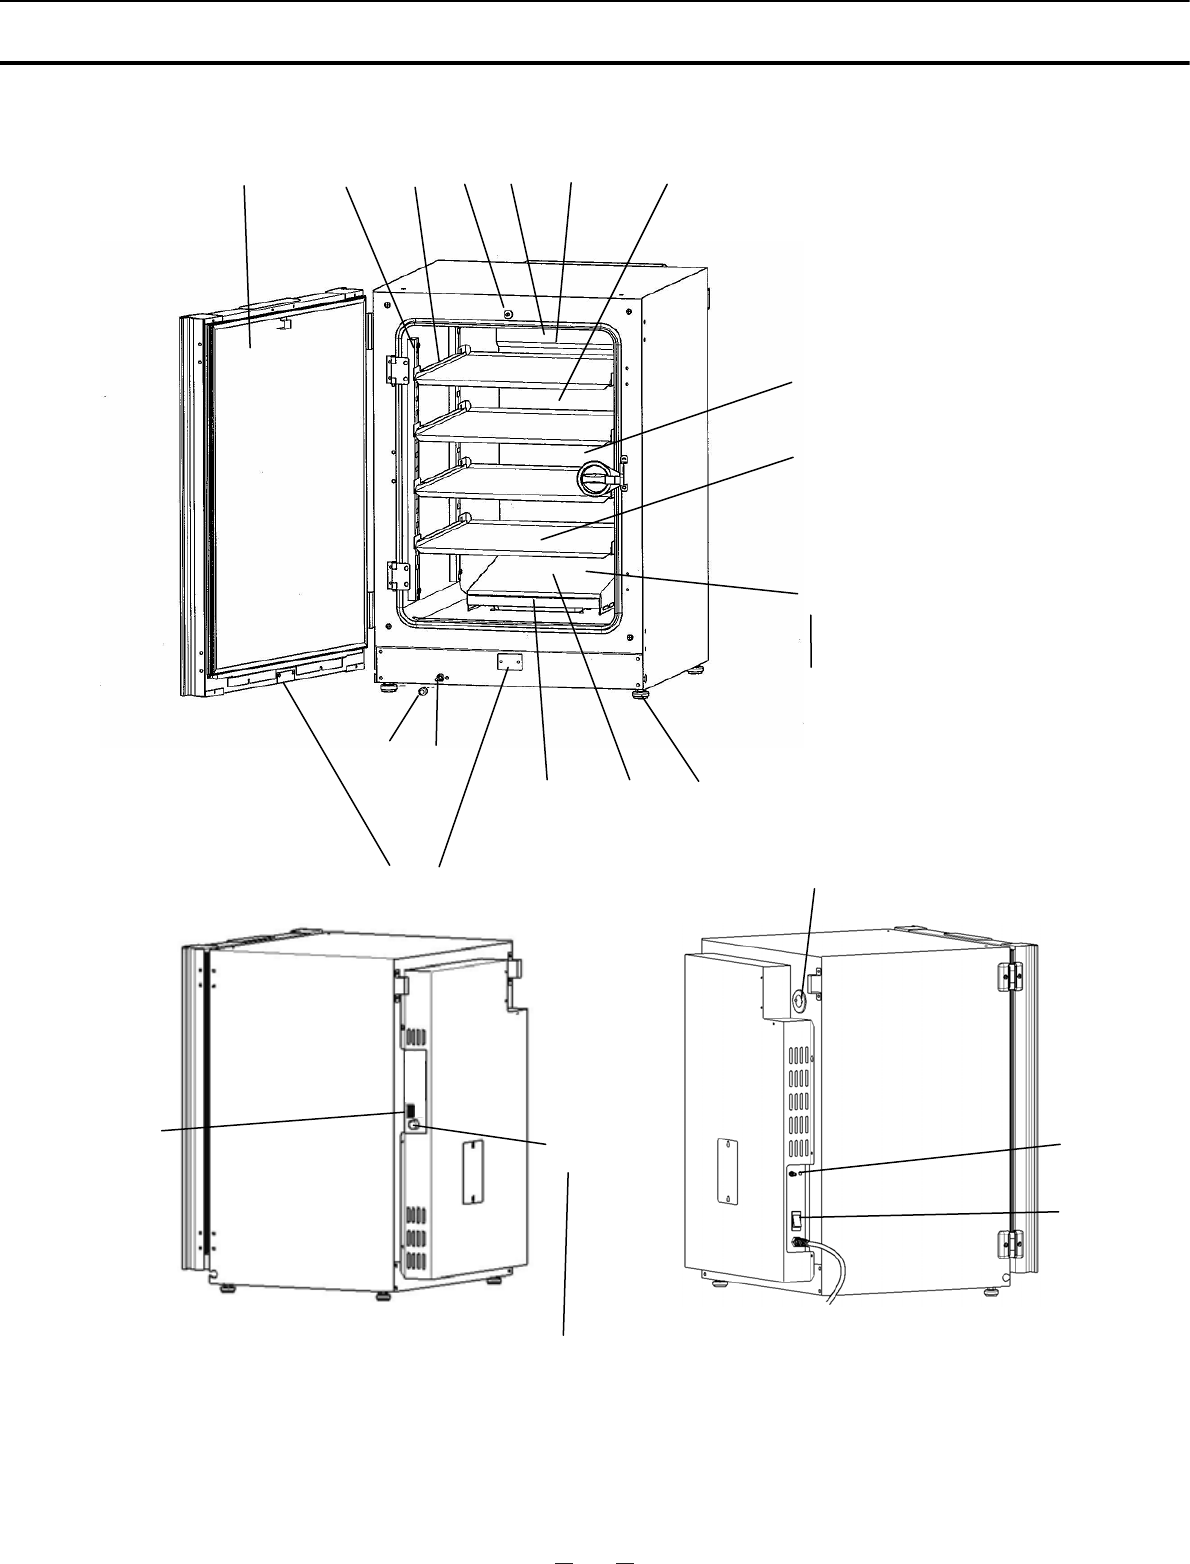 Sanyo MCO-19AIC, UV INCUBATOR COMPONENTS